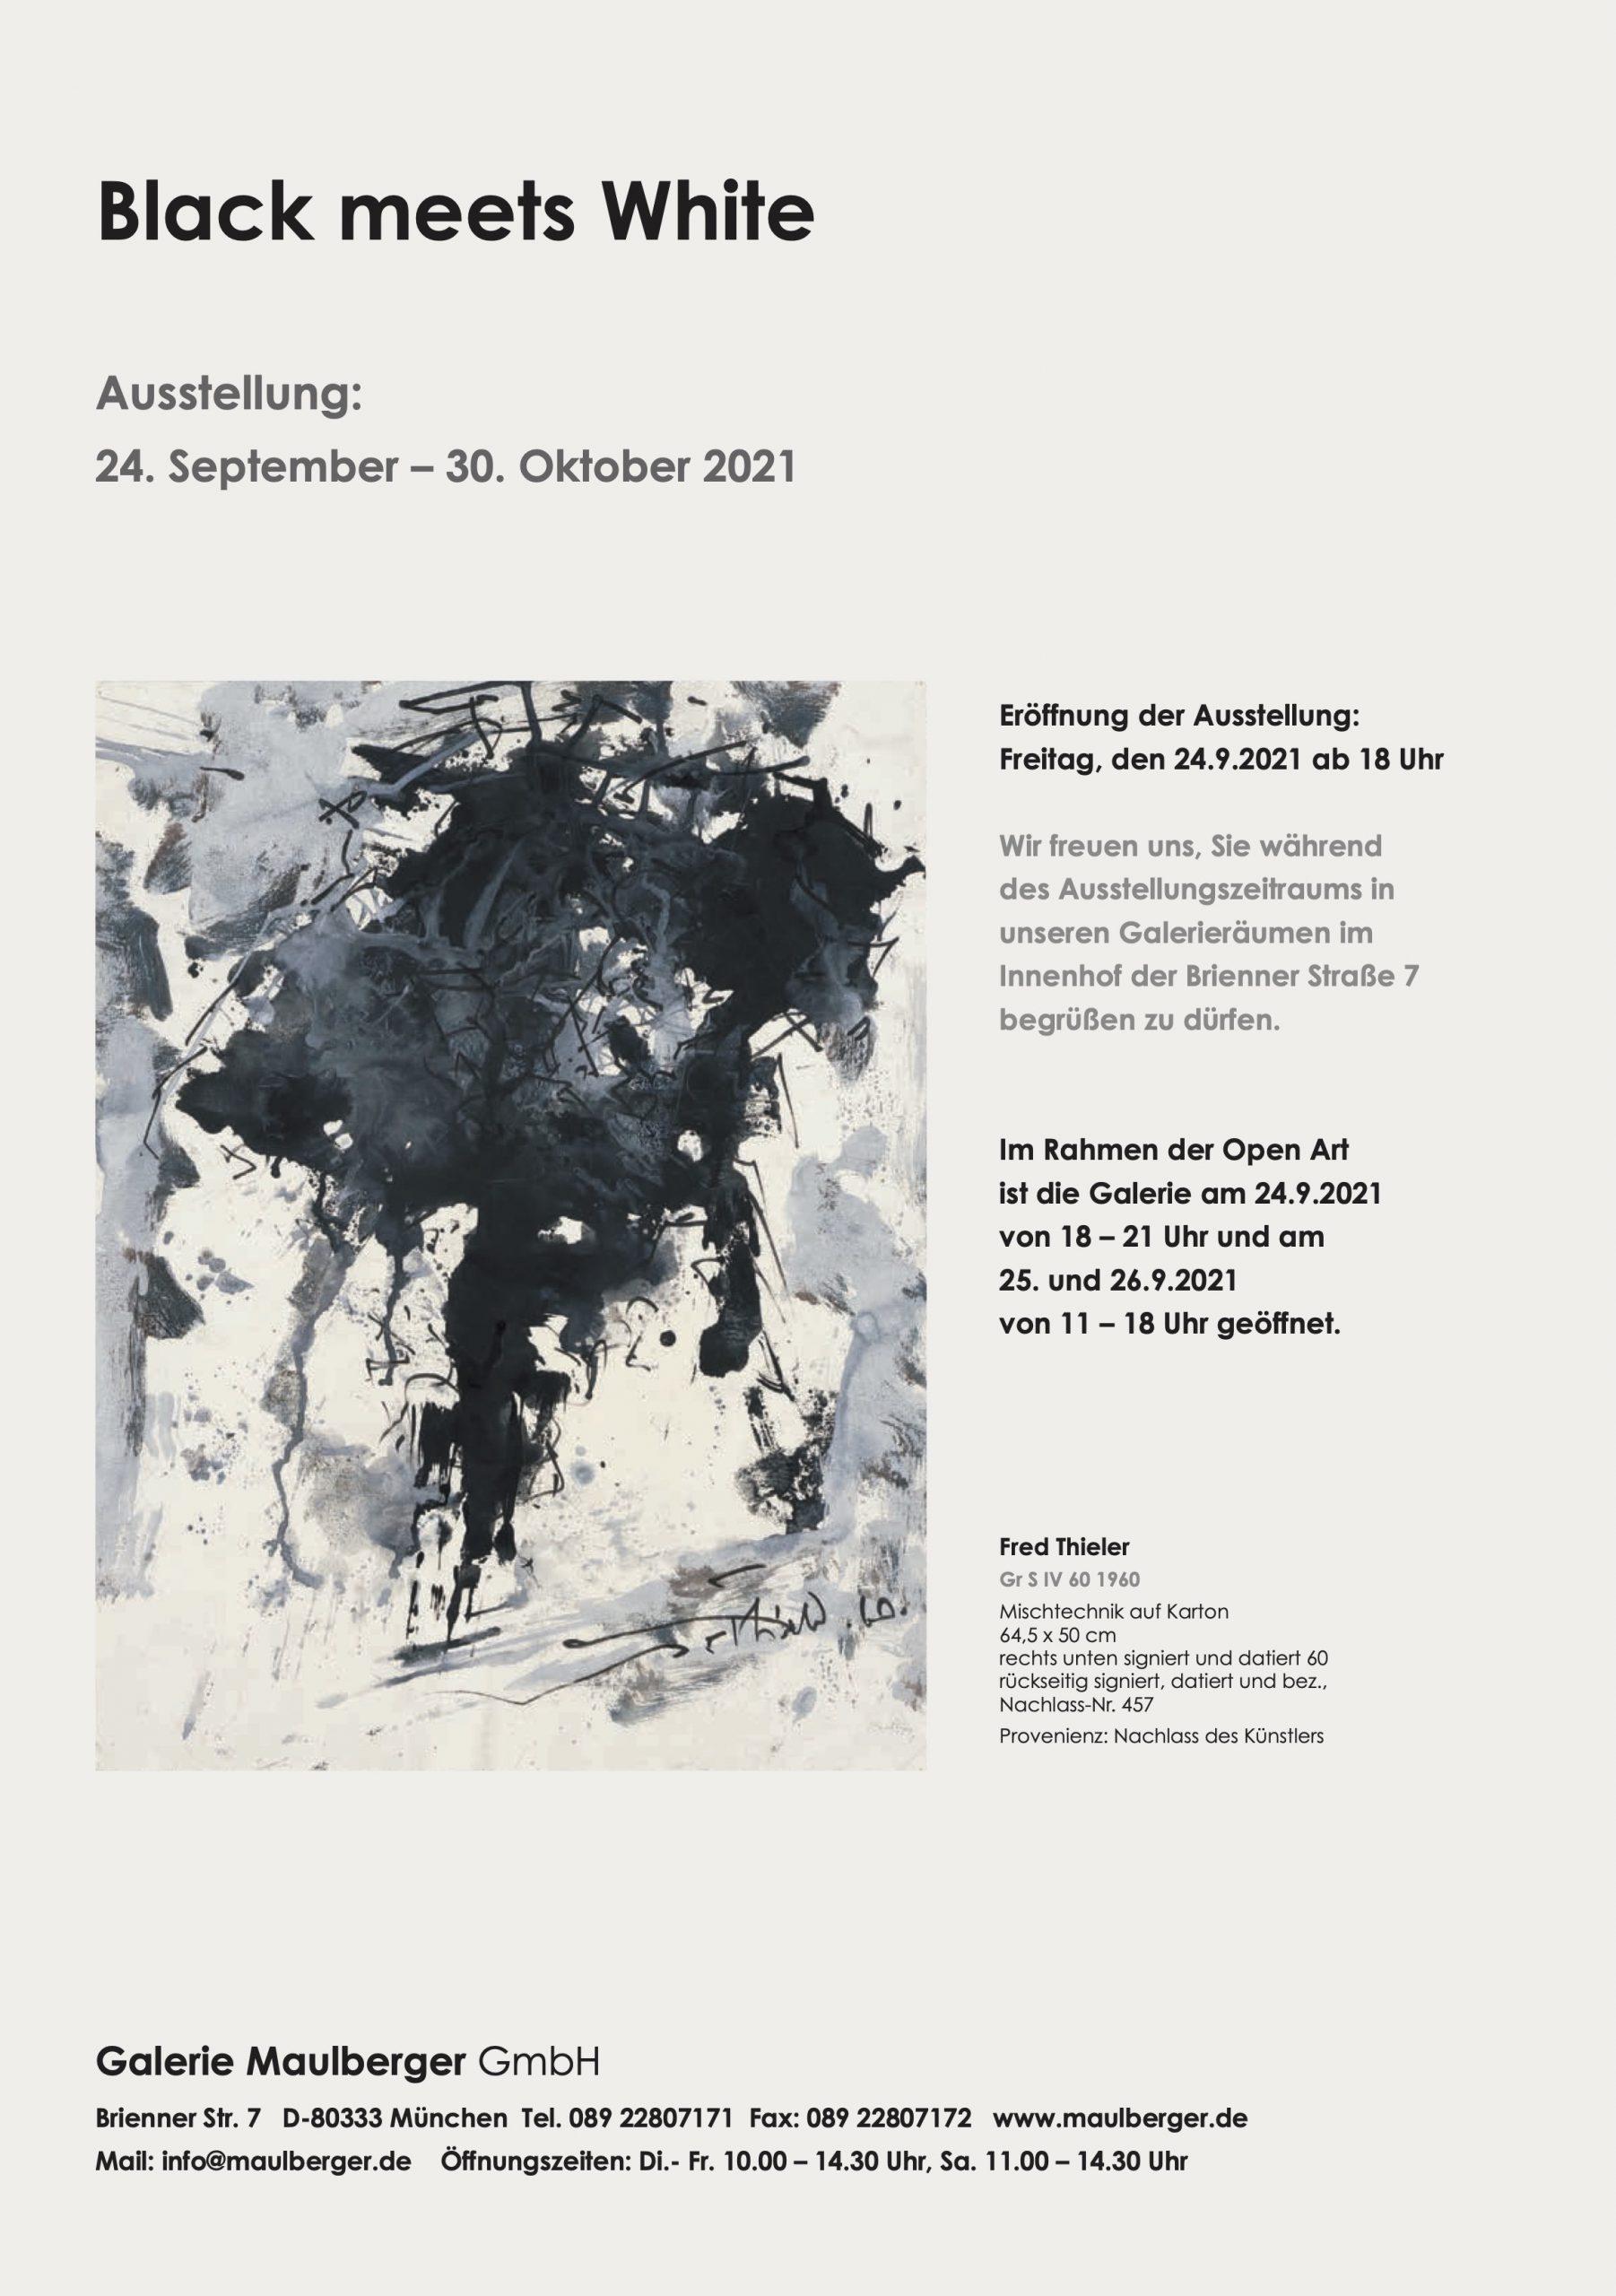 Ausstellung Black meets White 2021 Galerie Maulberger 06